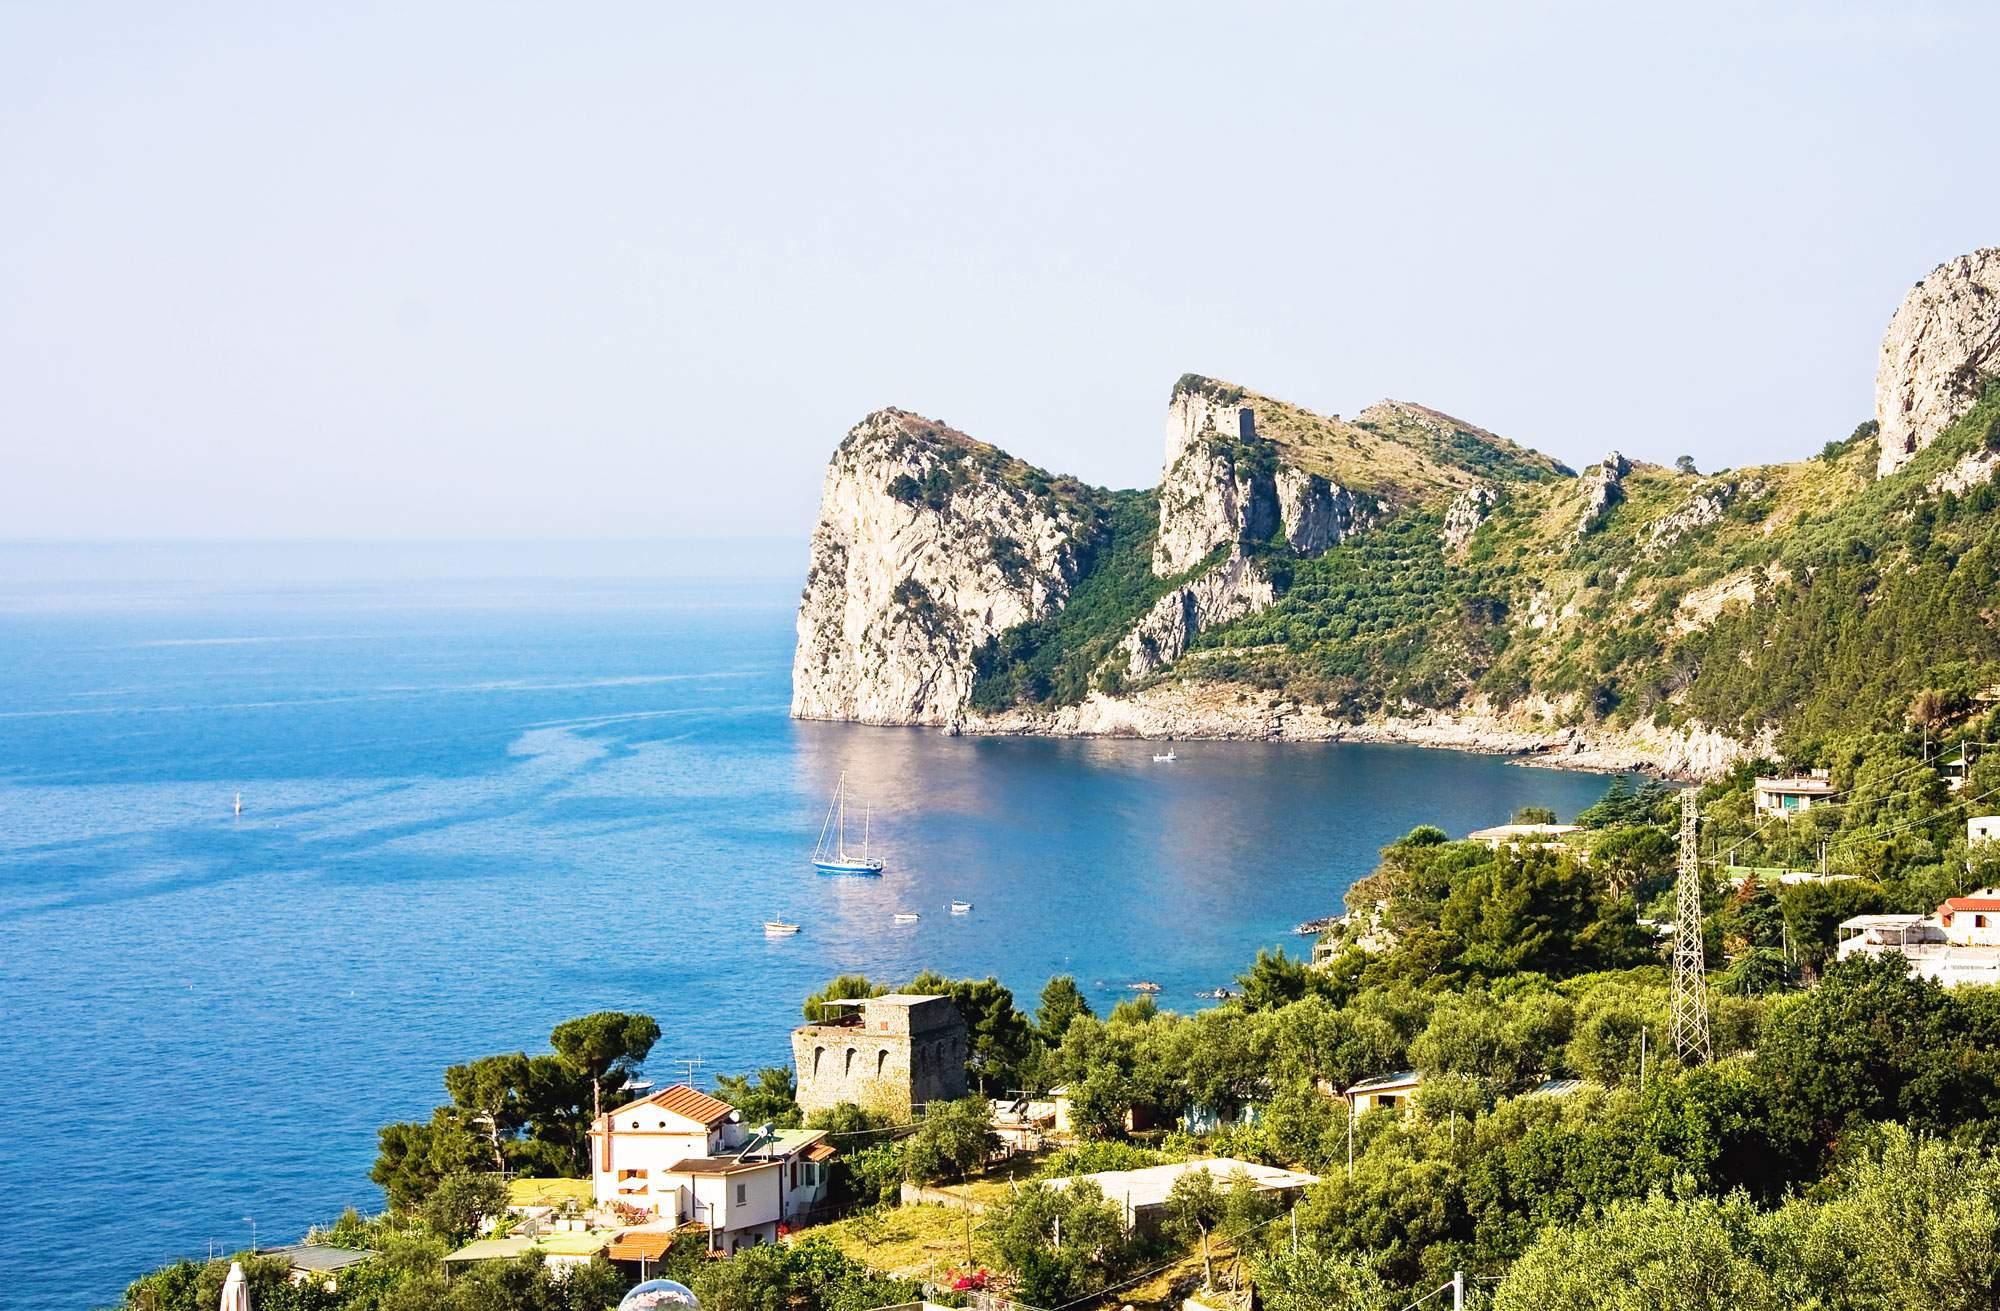 nerano-amalfi-coast-italy-village-town